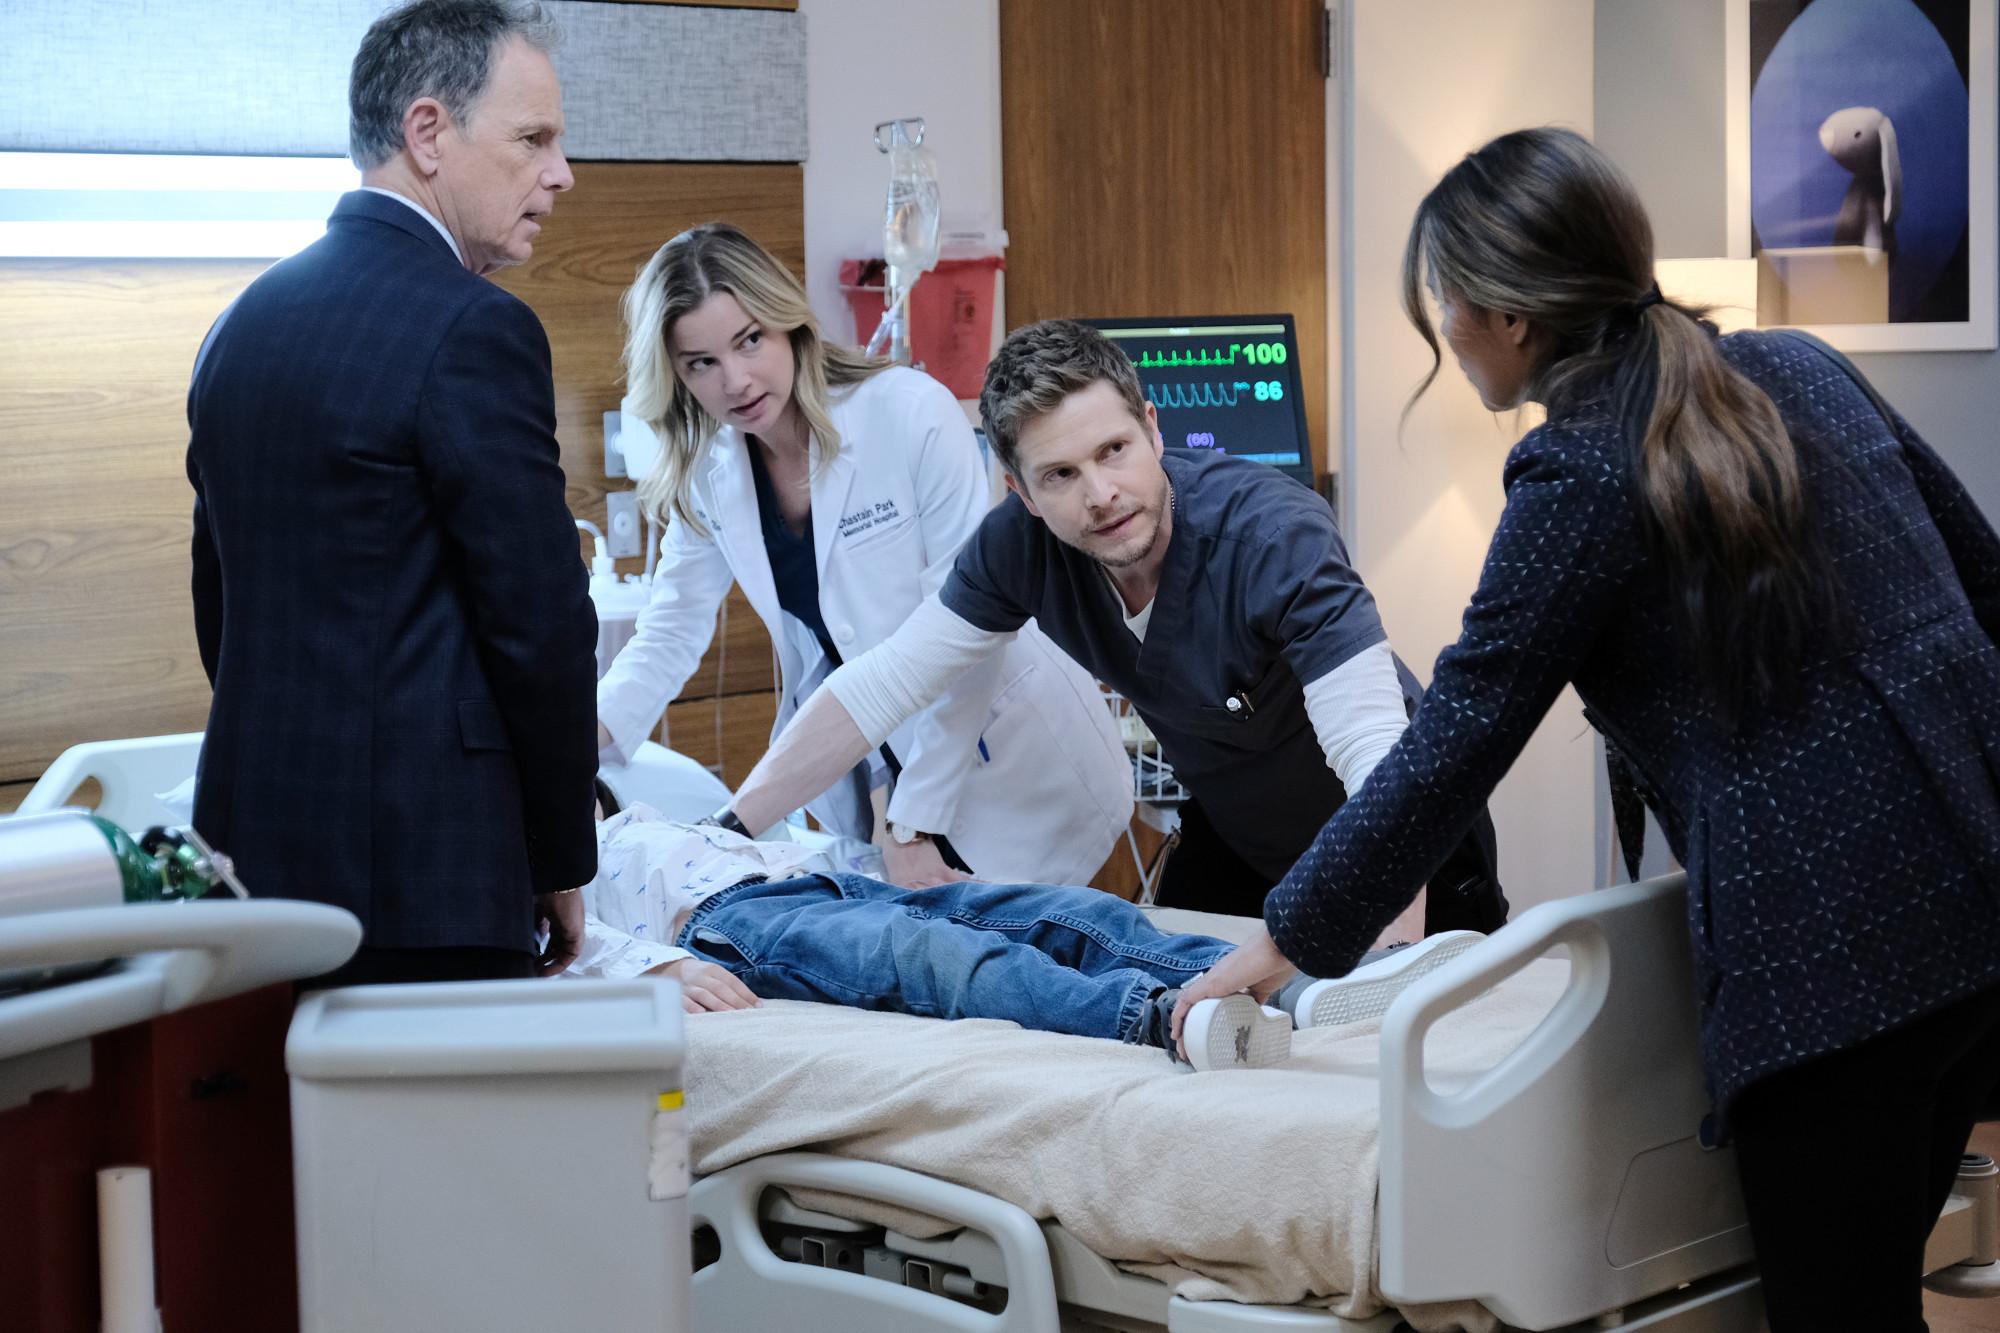 Atlanta Medical: Queens | Season 2 | Episode 15